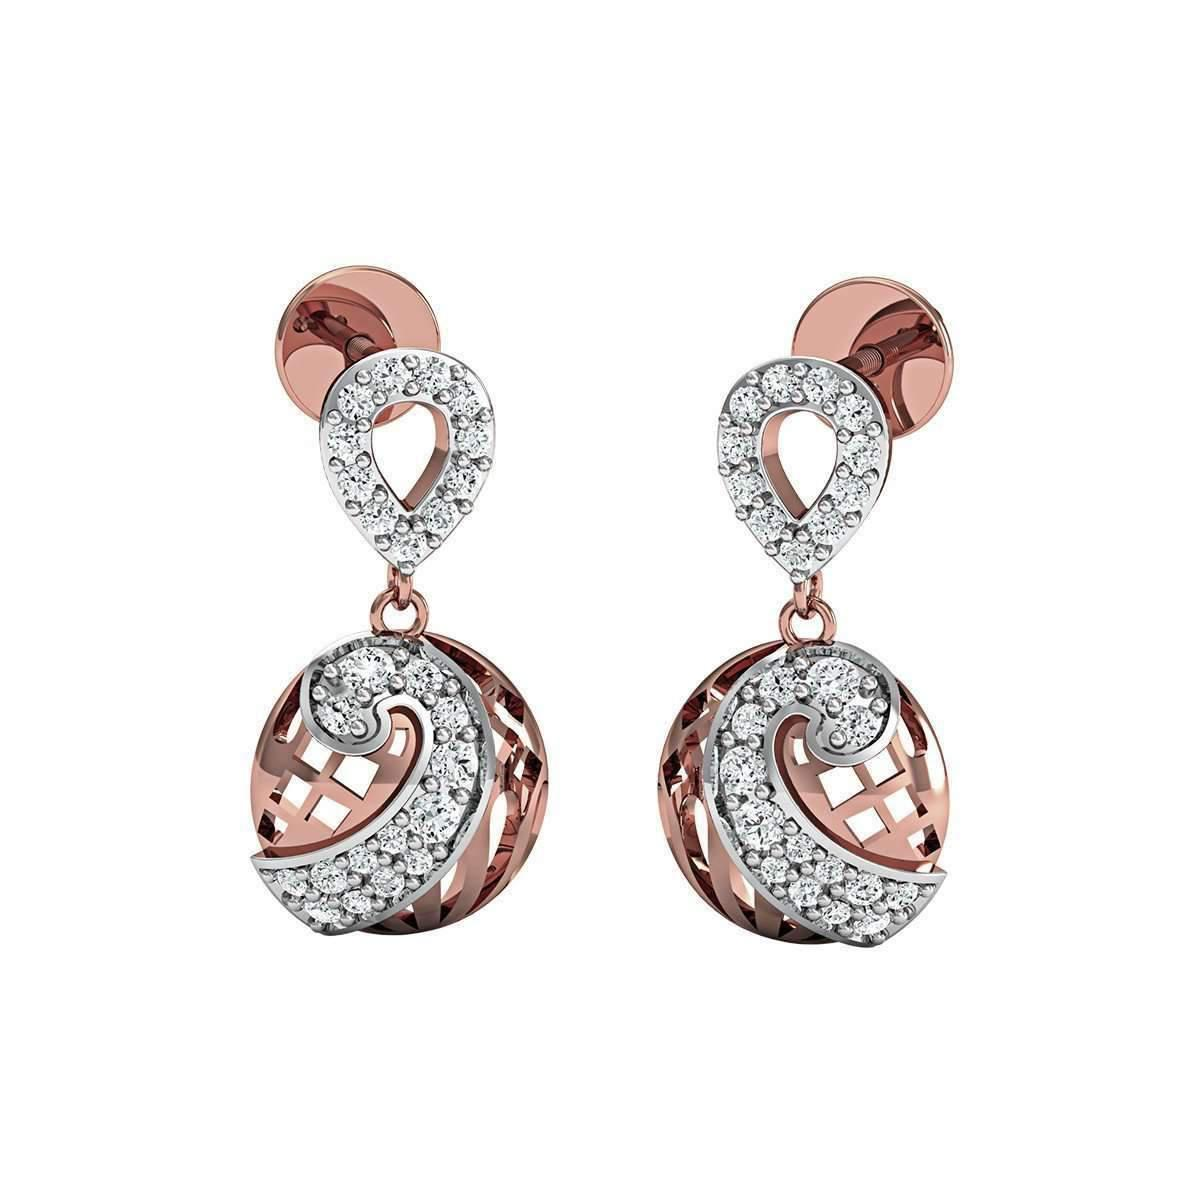 Diamoire Jewels Round Cut Premium Quality Diamond Earrings in 14kt Rose Gold sdeGF5peZV